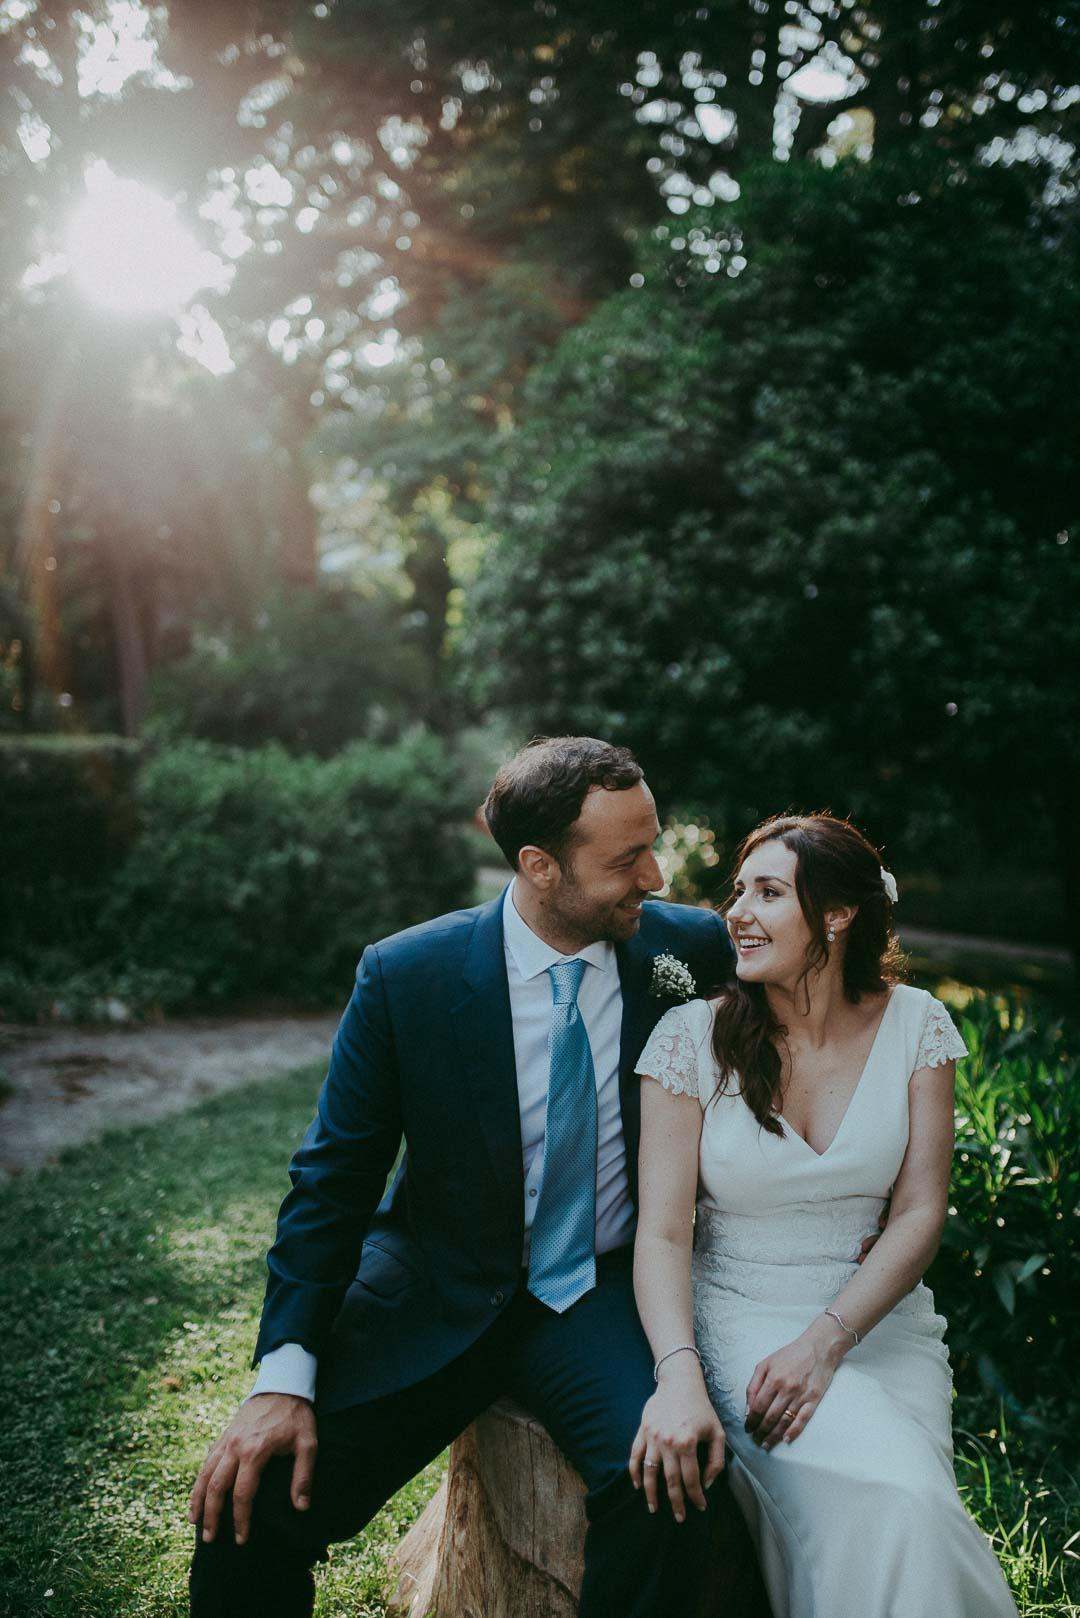 wedding-photographer-destination-fineart-bespoke-reportage-sorrento-parcodeiprincipi-vivianeizzo-spazio46-81